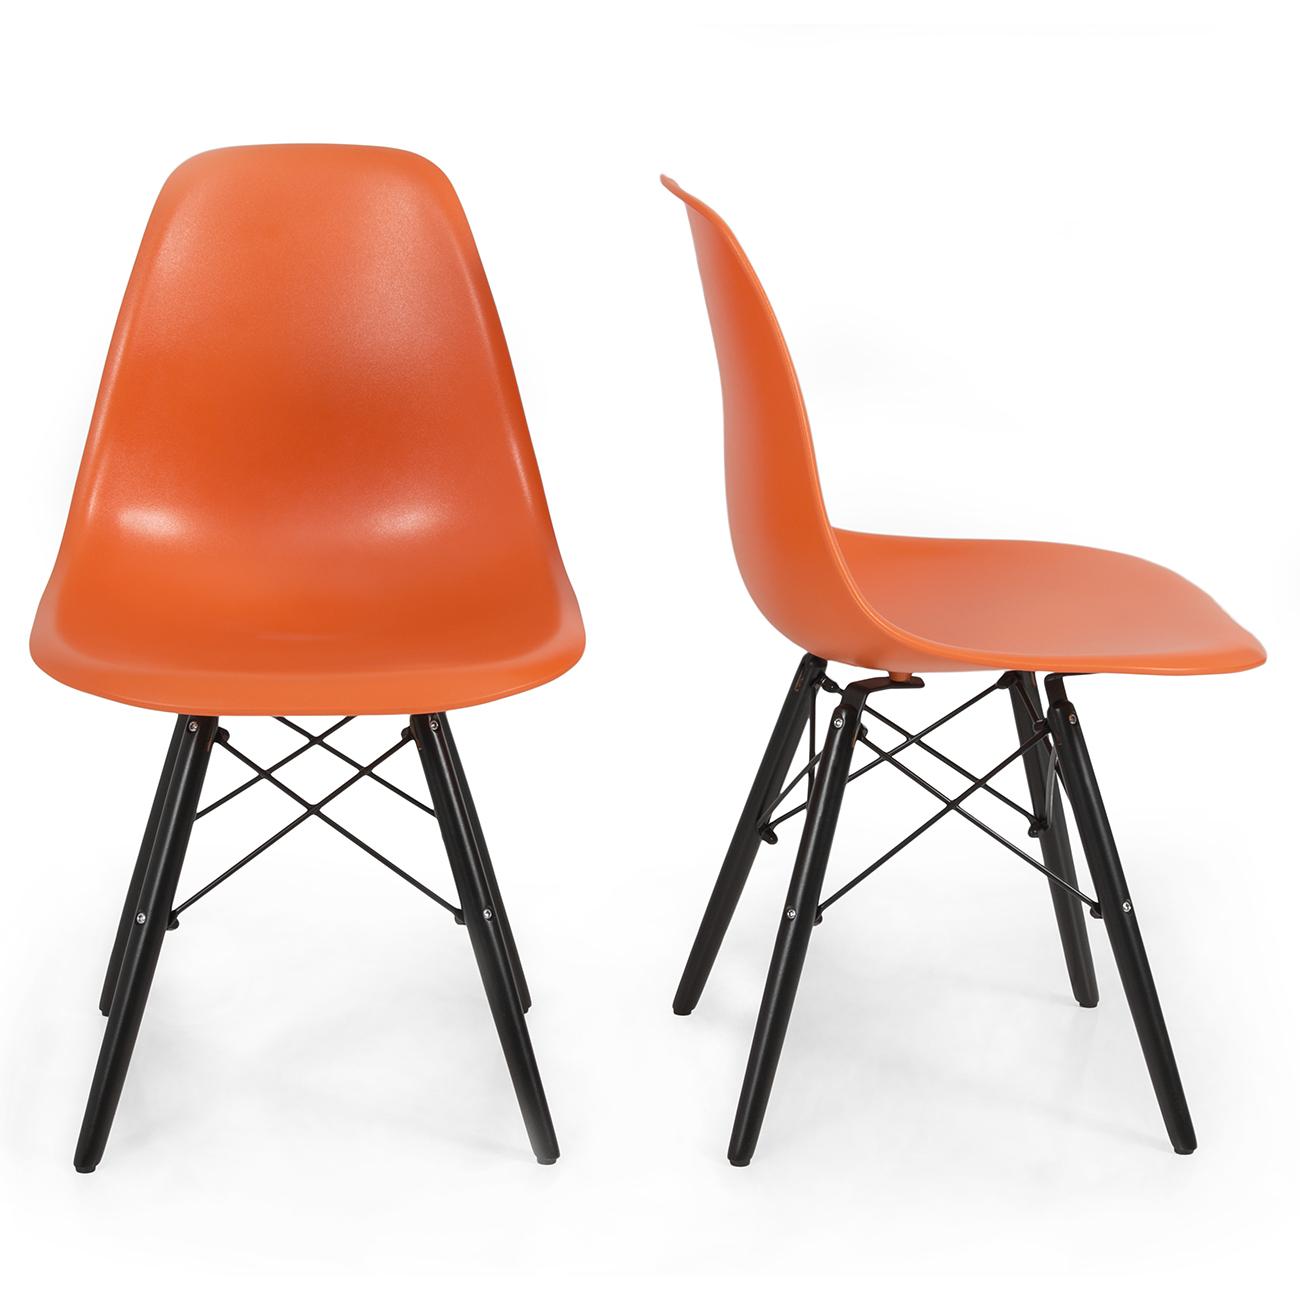 Set of 2 mid century eames style dsw eiffel side chair dowel black wood bas - Eames dsw eiffel chair ...